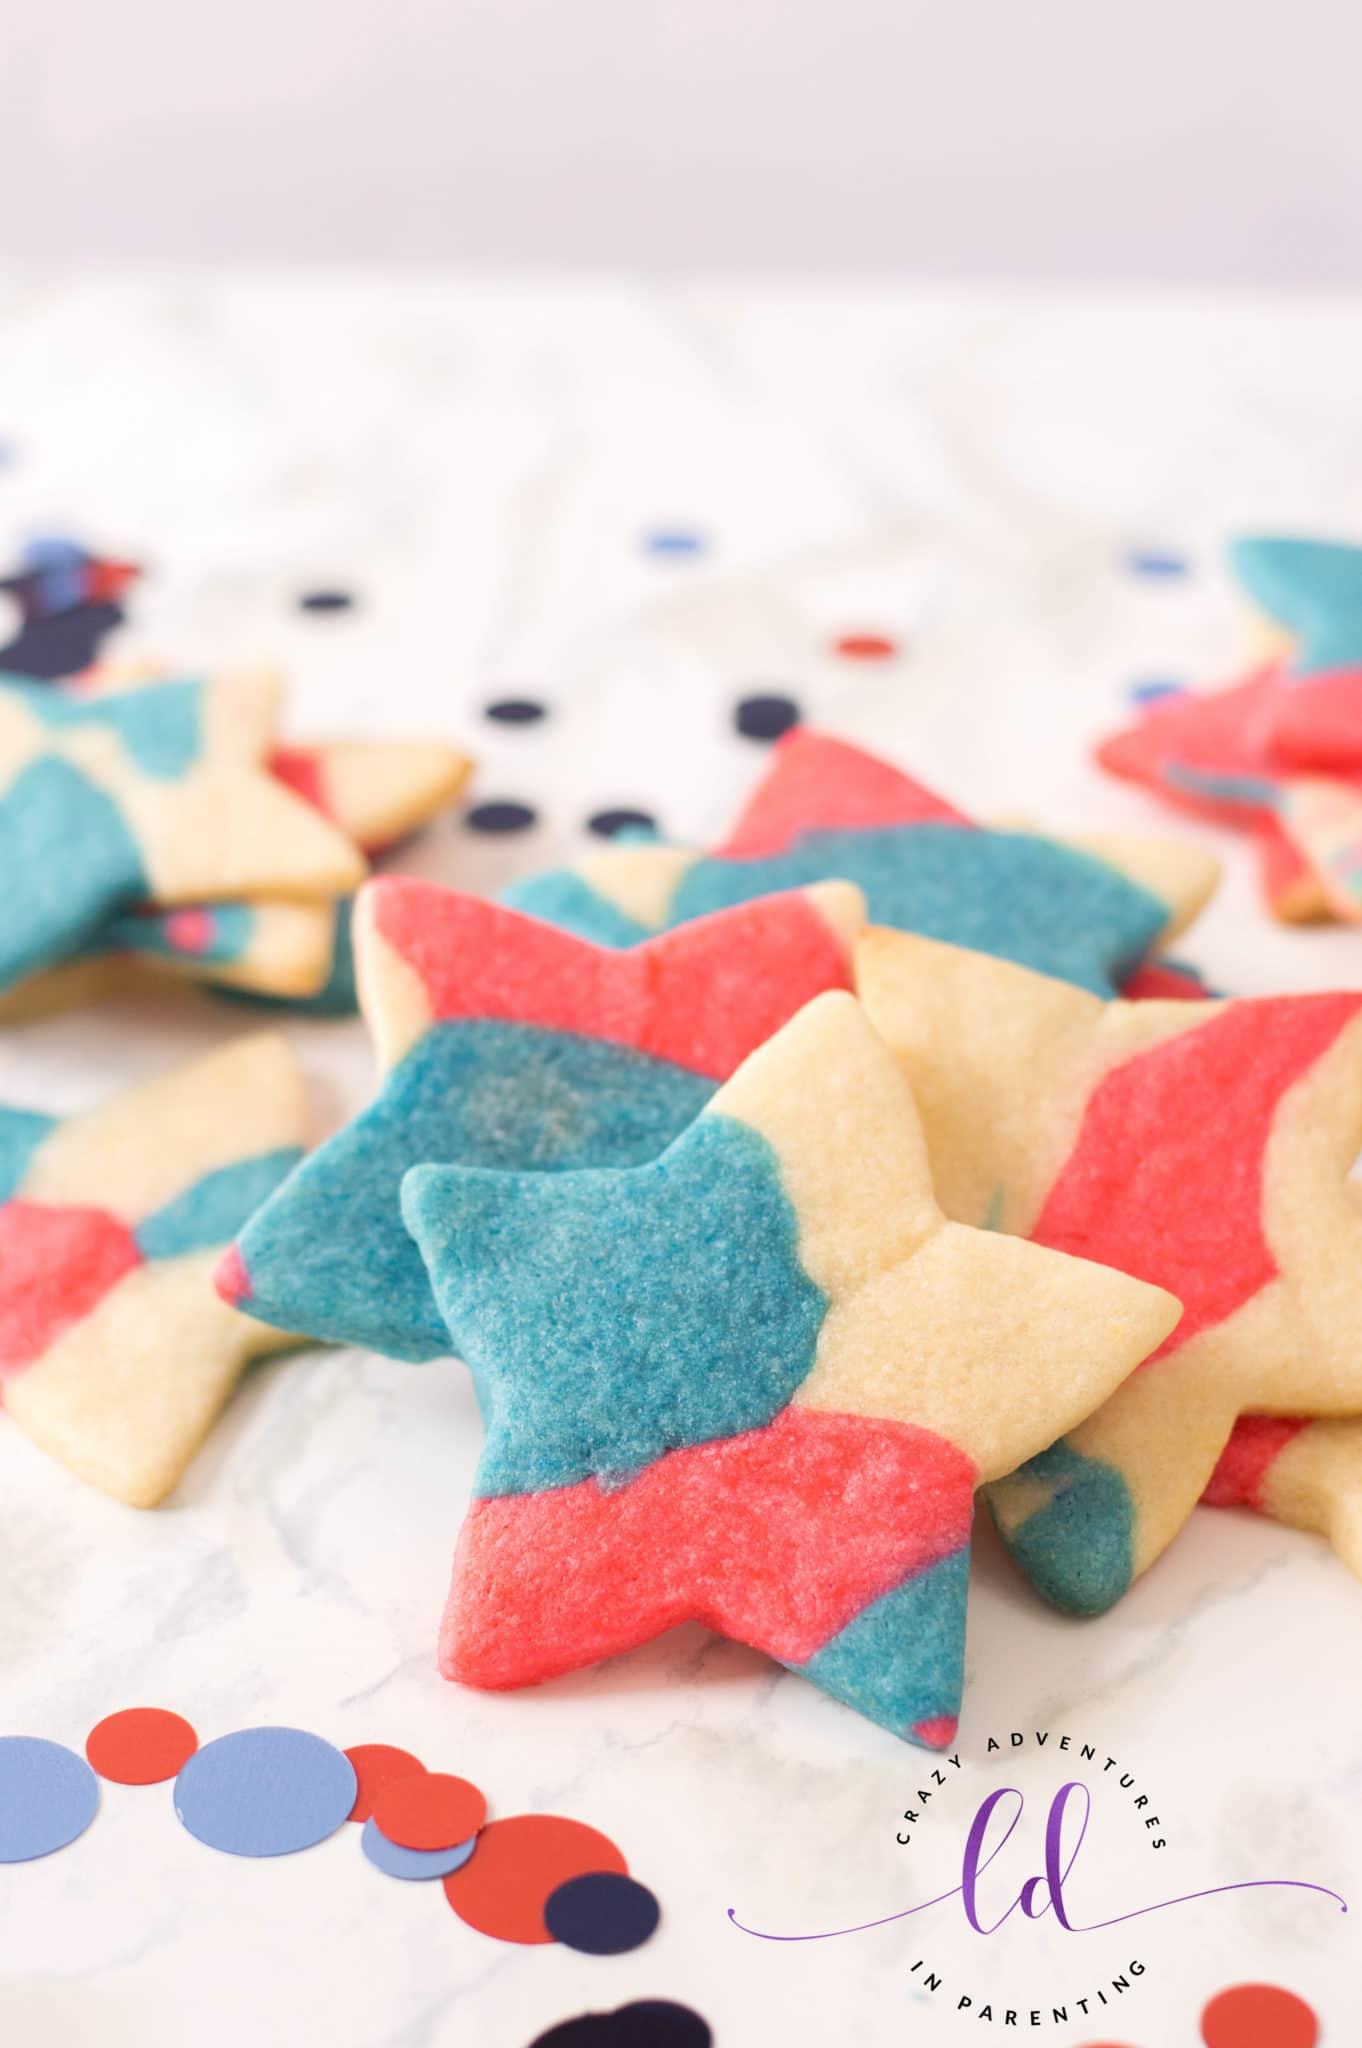 Patriotic Sugar Cookies Recipe for Flag Day